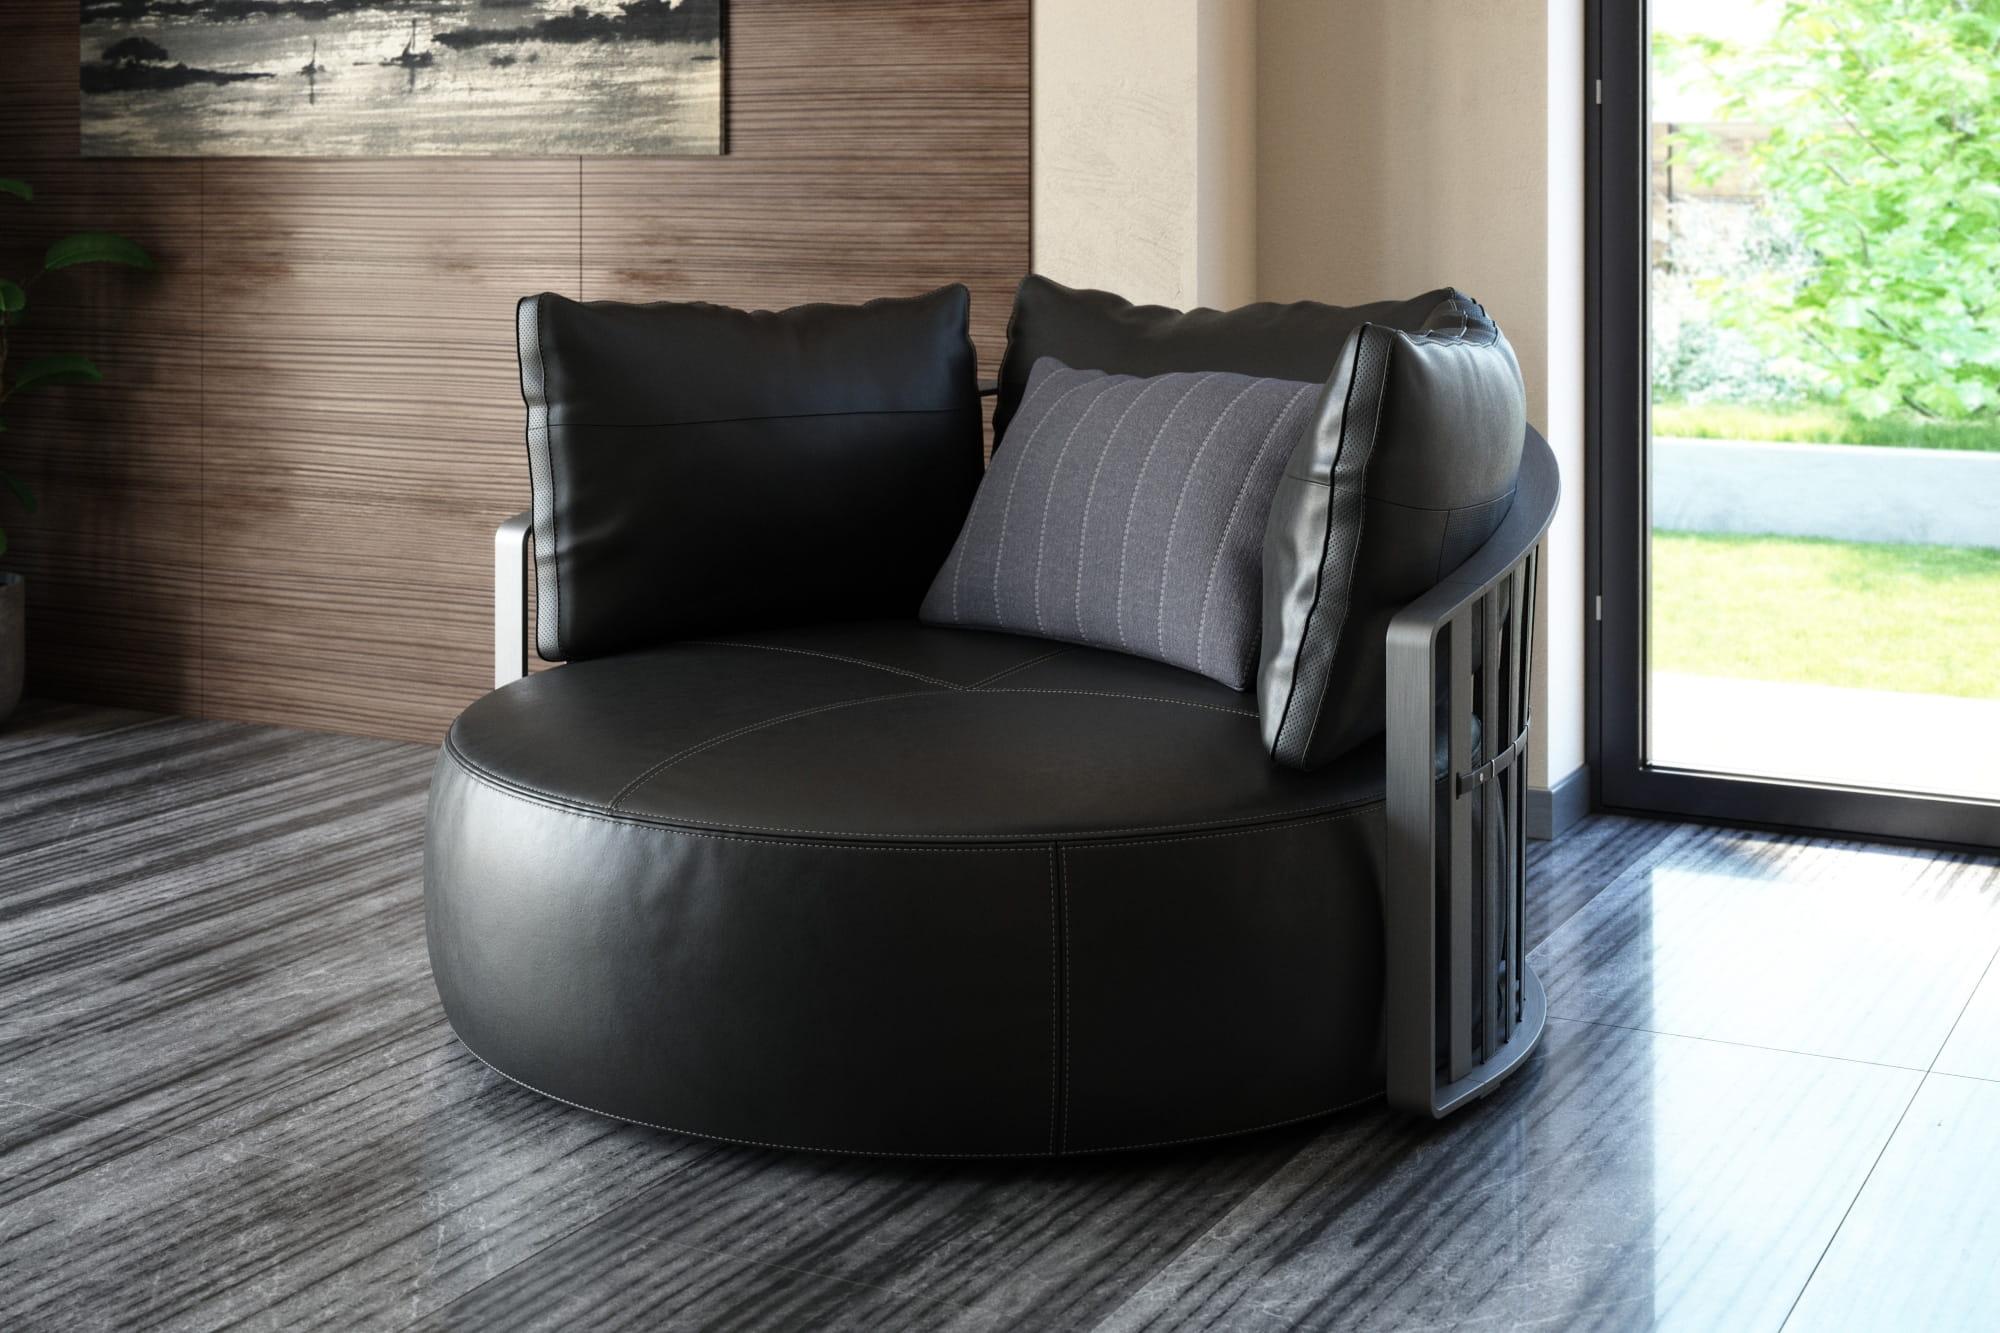 Furniture 18 AM245 Archmodels